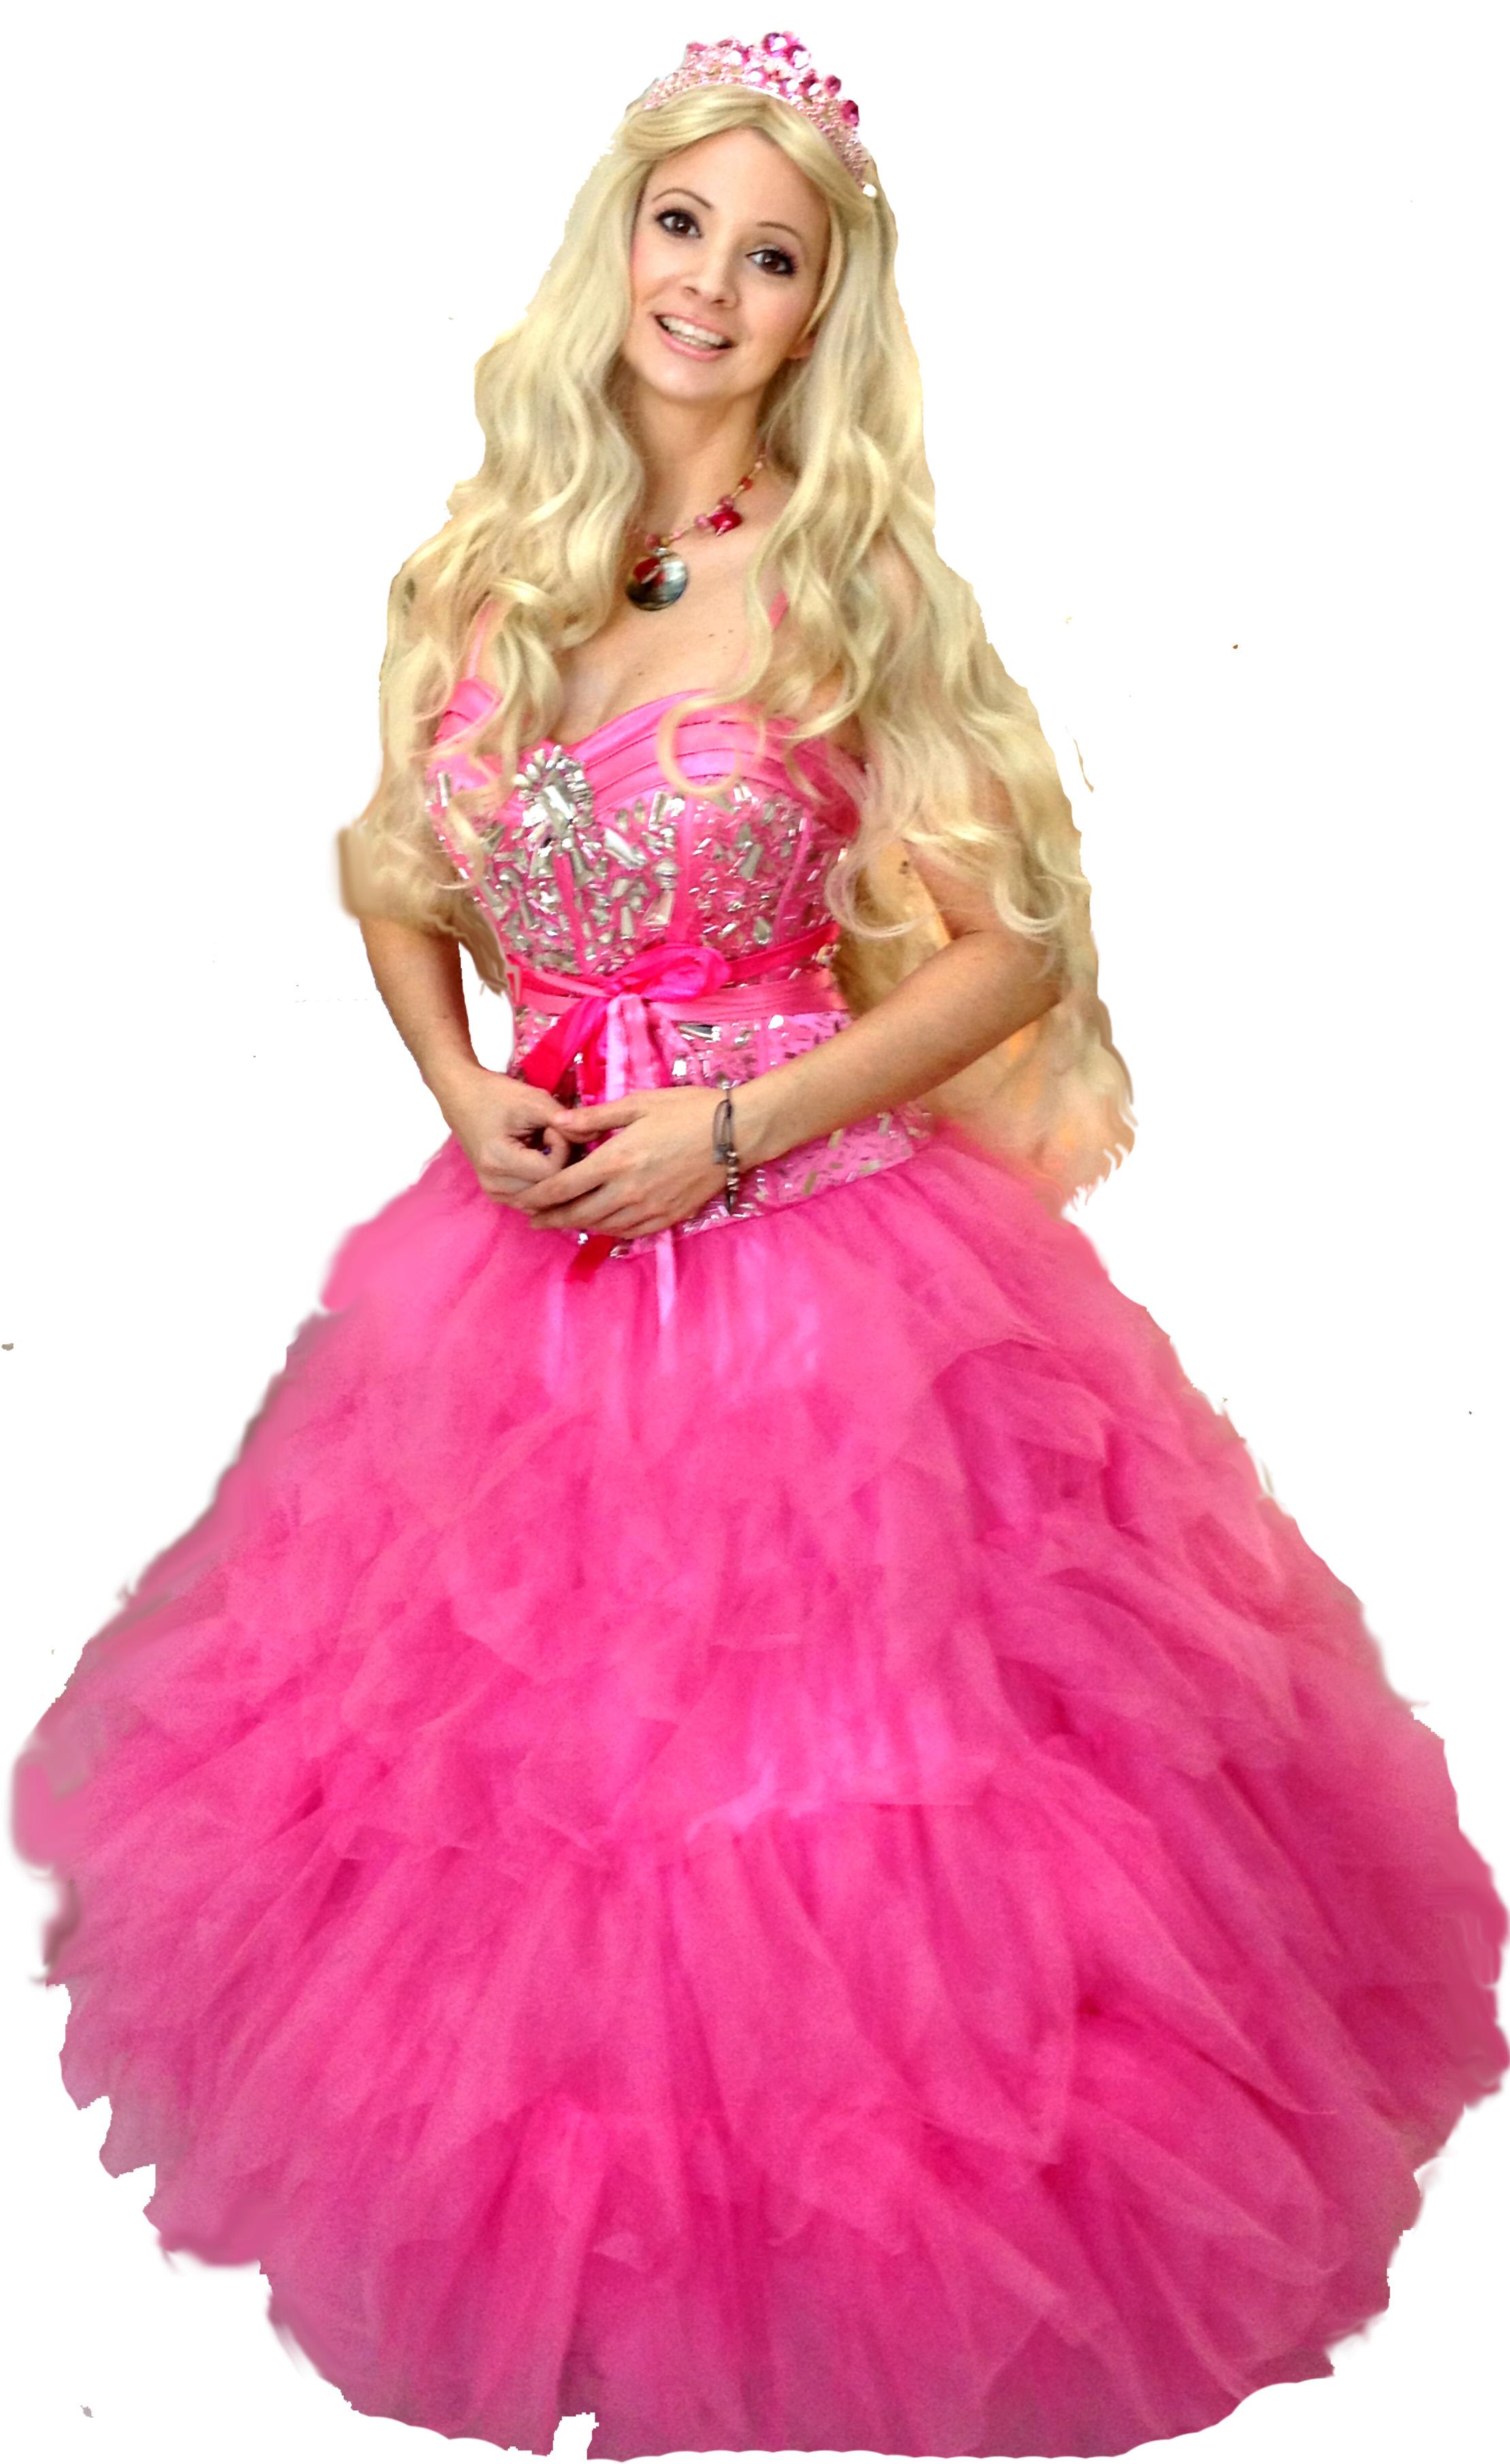 Index of /images/princess site/Barbie Pop Star.